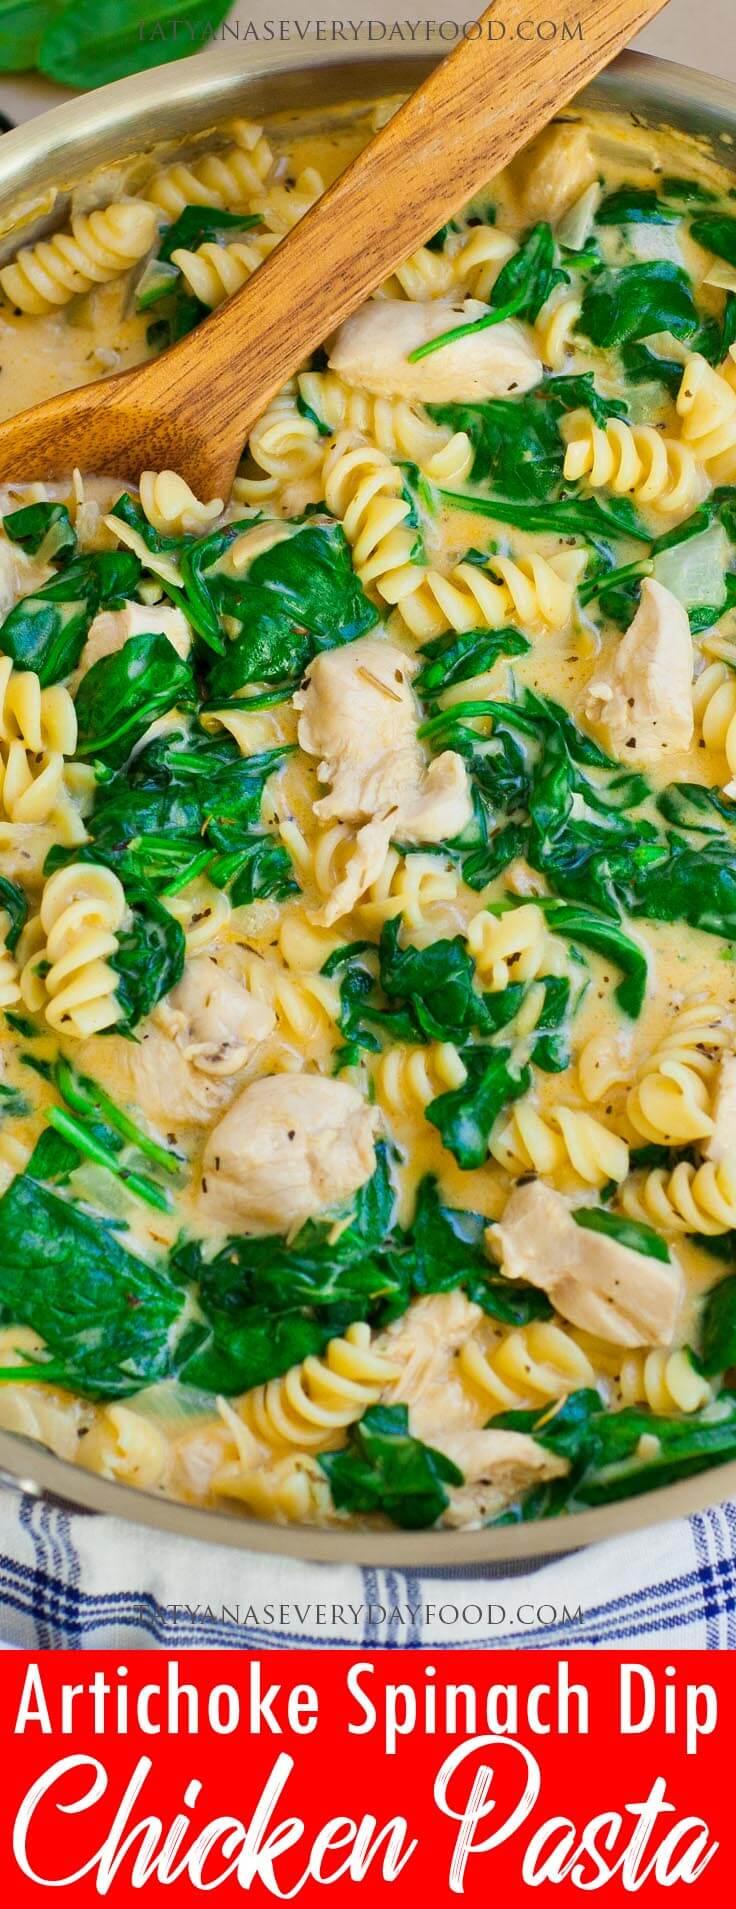 Spinach Artichoke Dip Chicken Pasta video recipe